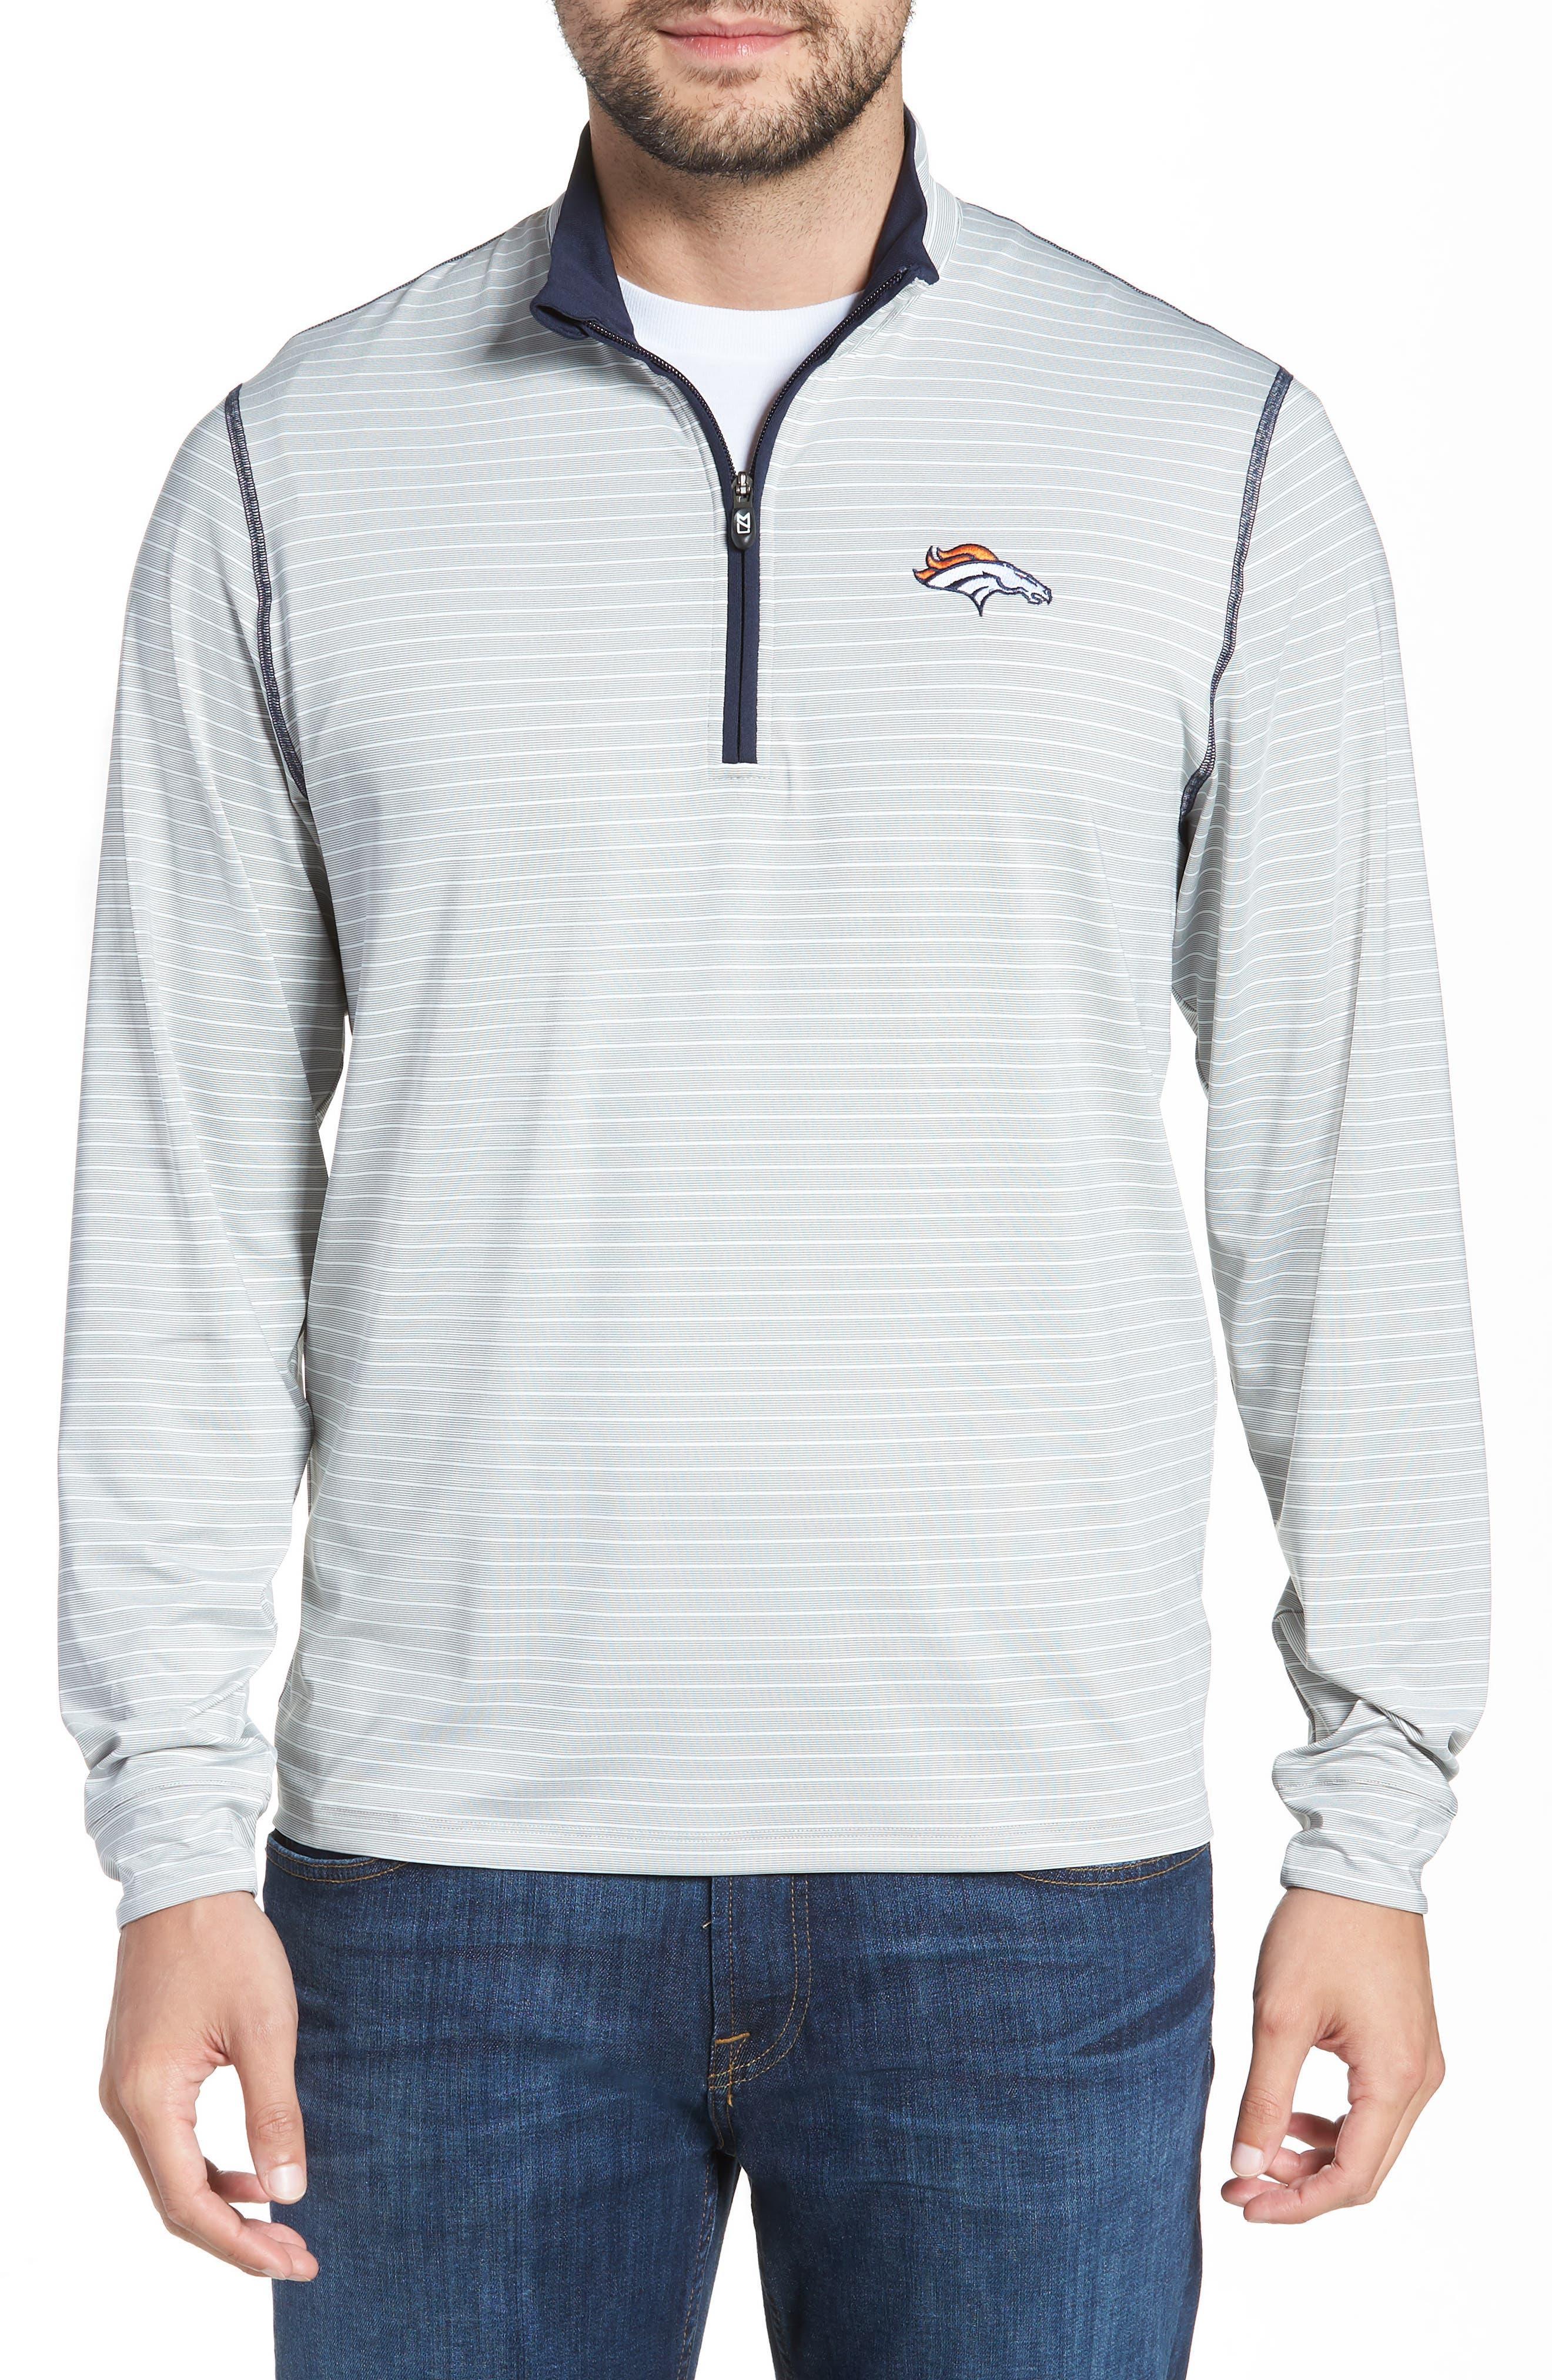 Meridian - Denver Broncos Regular Fit Half Zip Pullover,                             Main thumbnail 1, color,                             NAVY